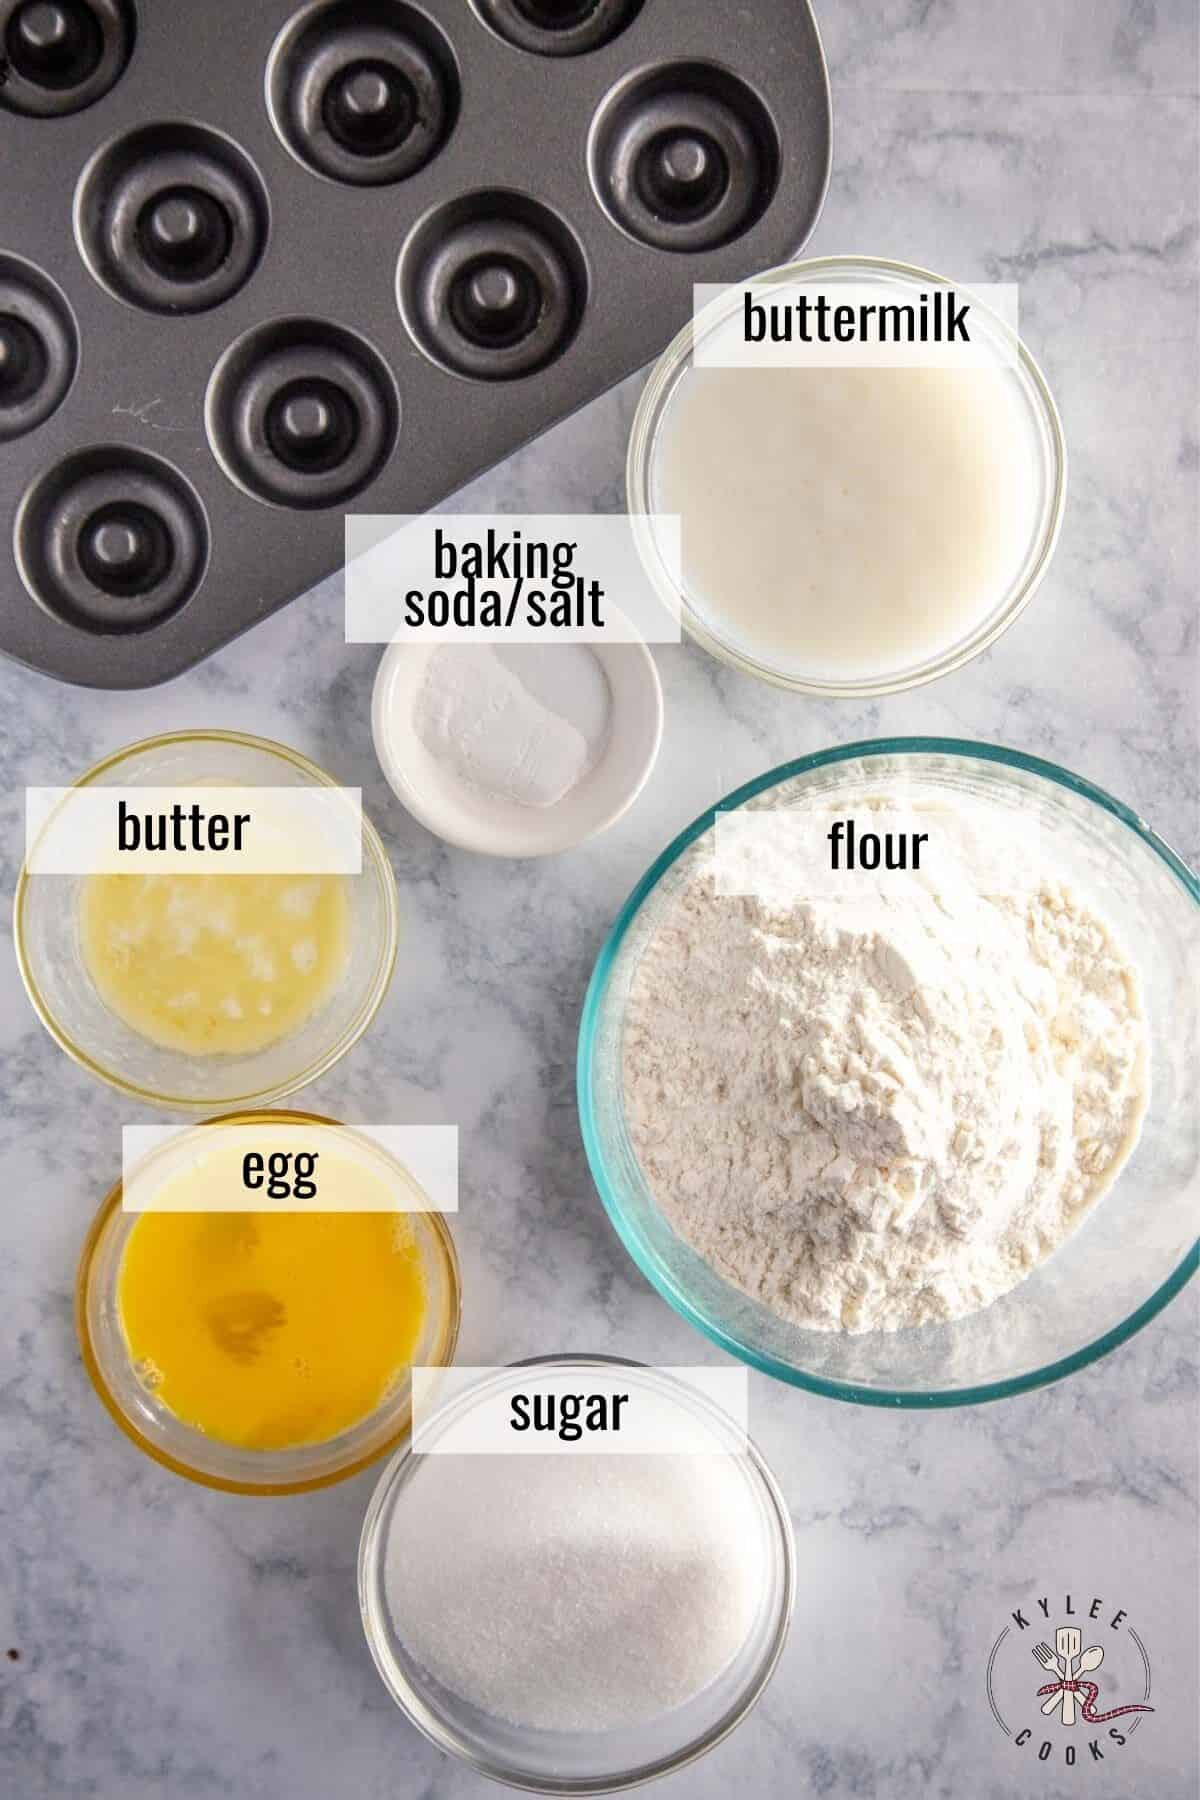 ingredients to make mini donuts